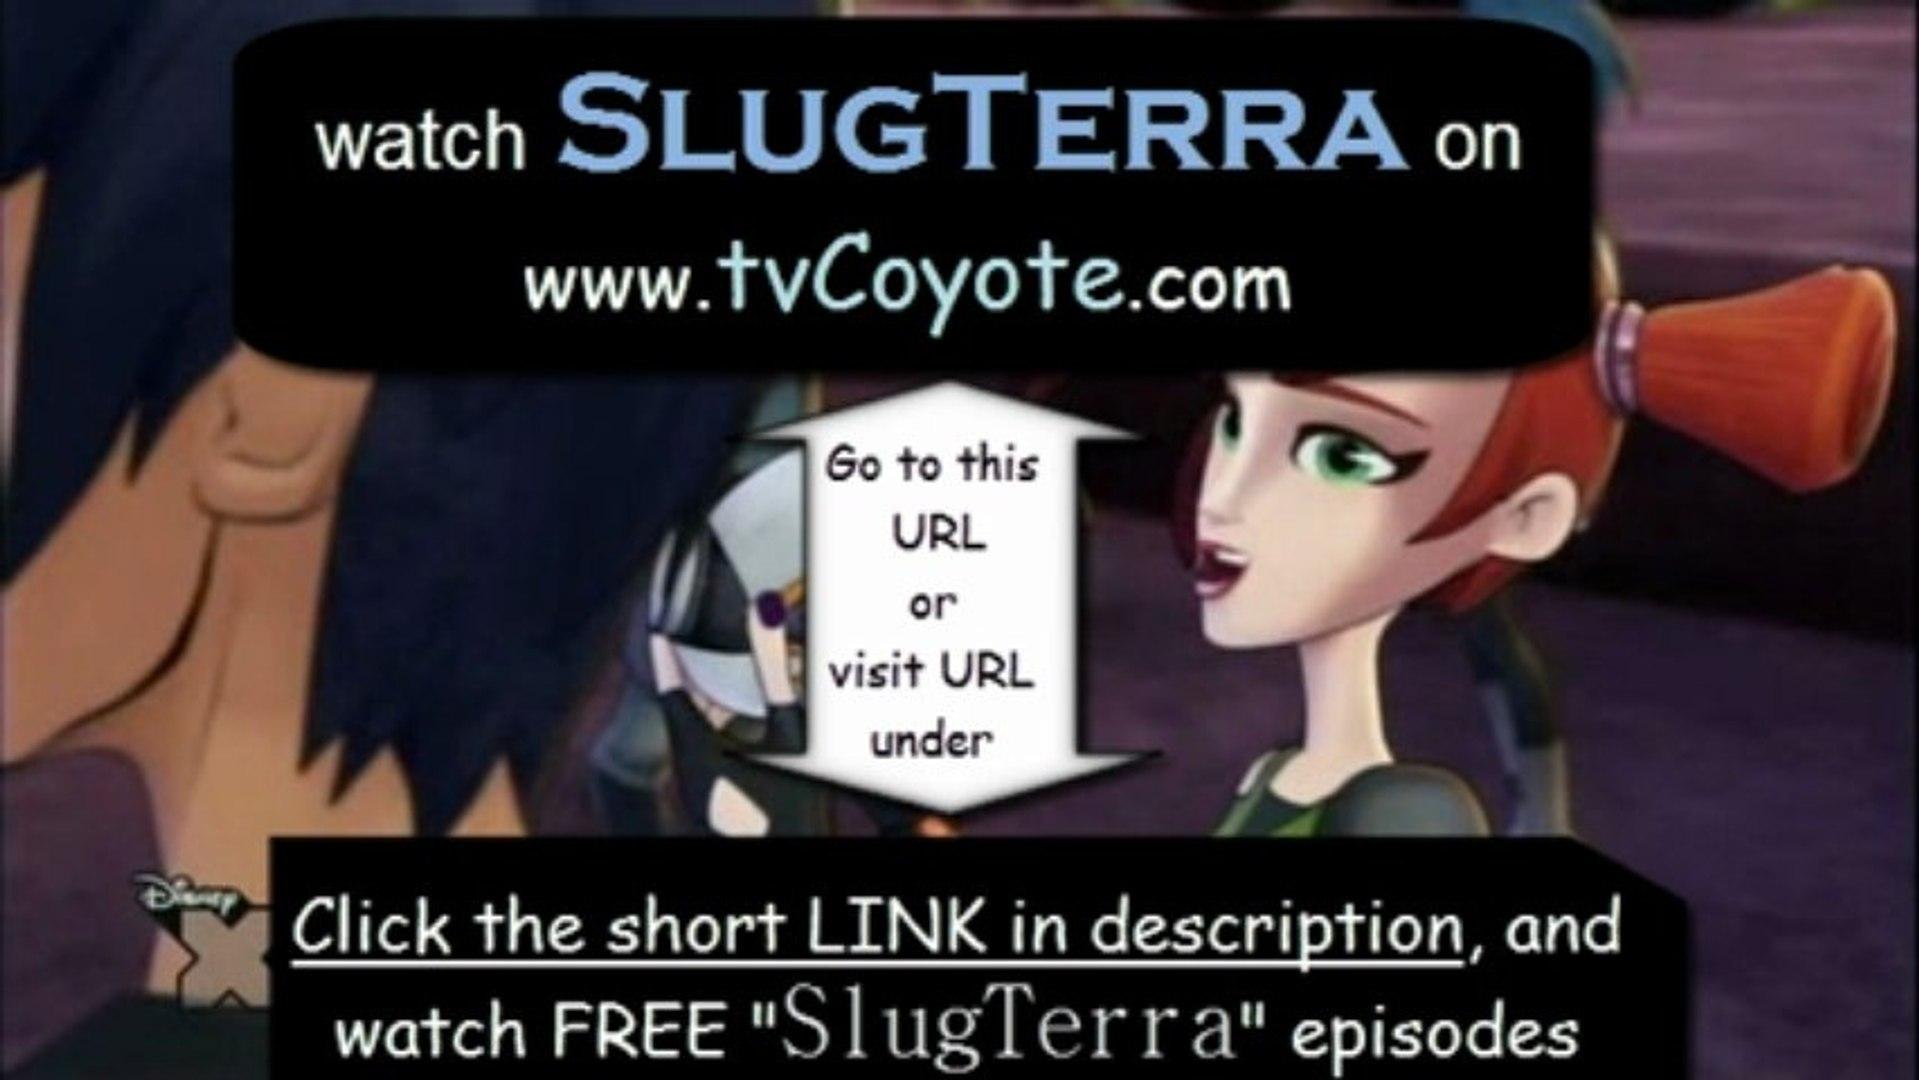 Slugterra Season 2 Episode 1 The New Kid Part 1 Video